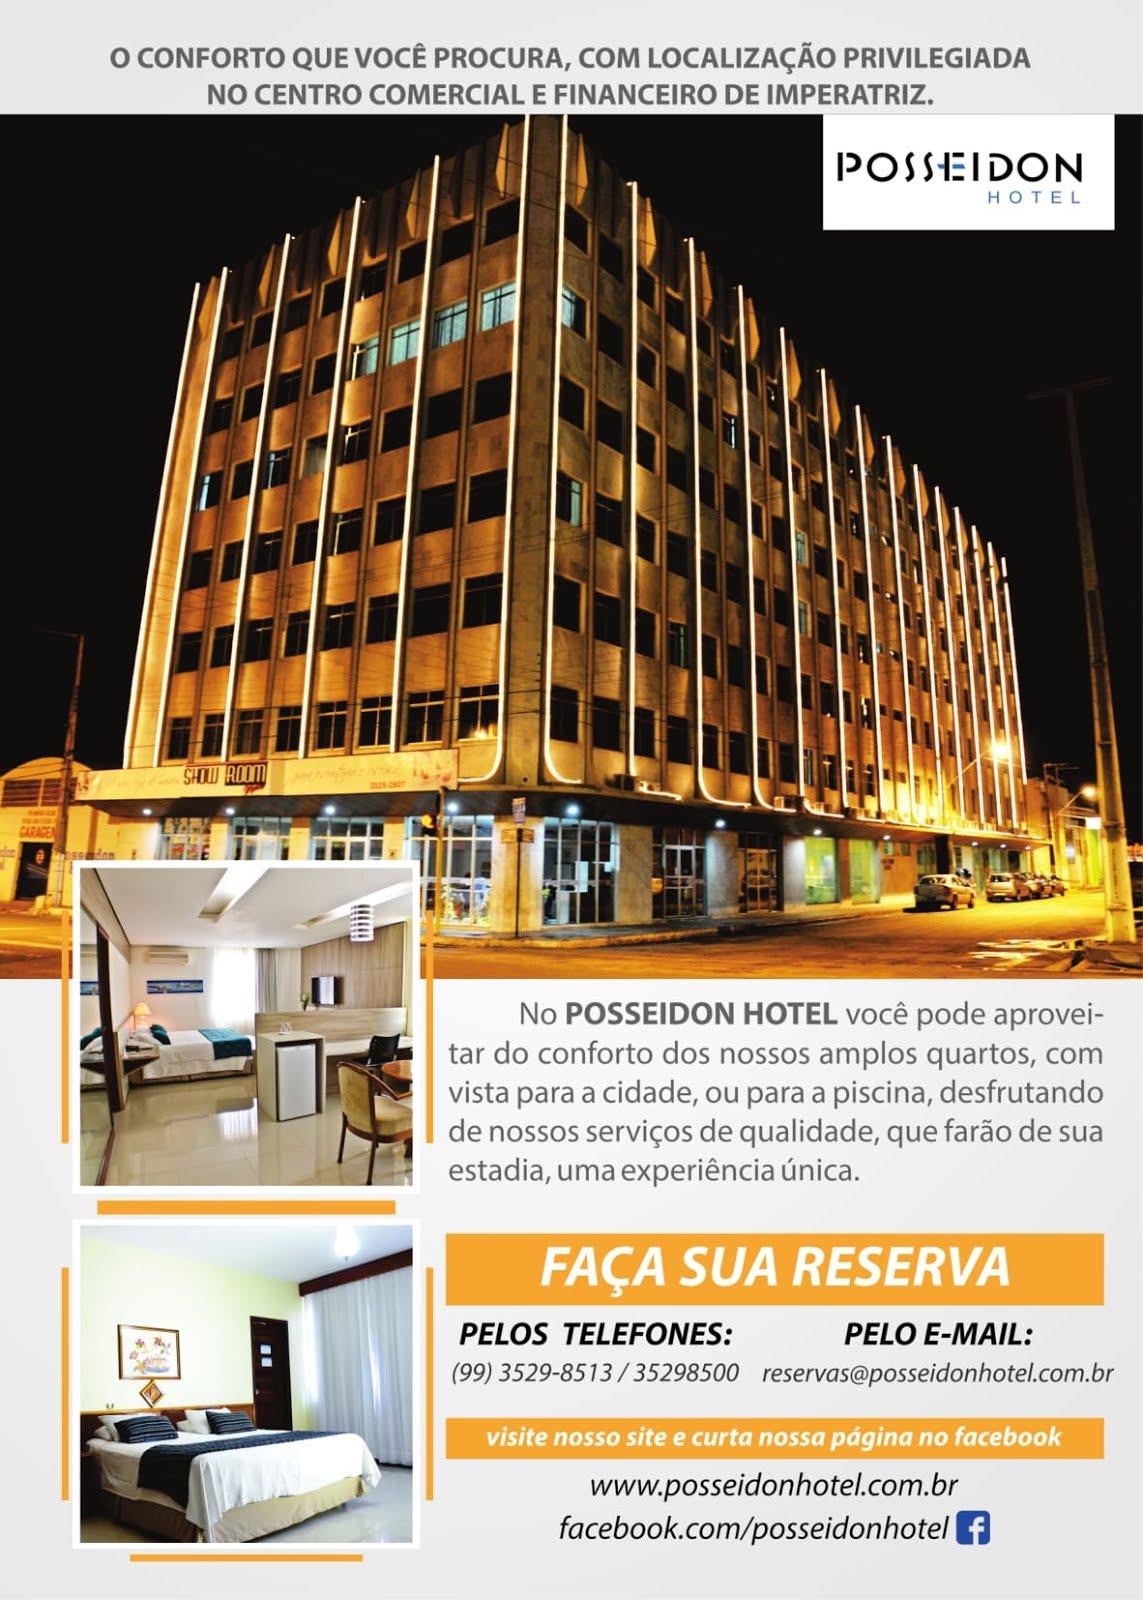 Posseidon Hotel Ltda